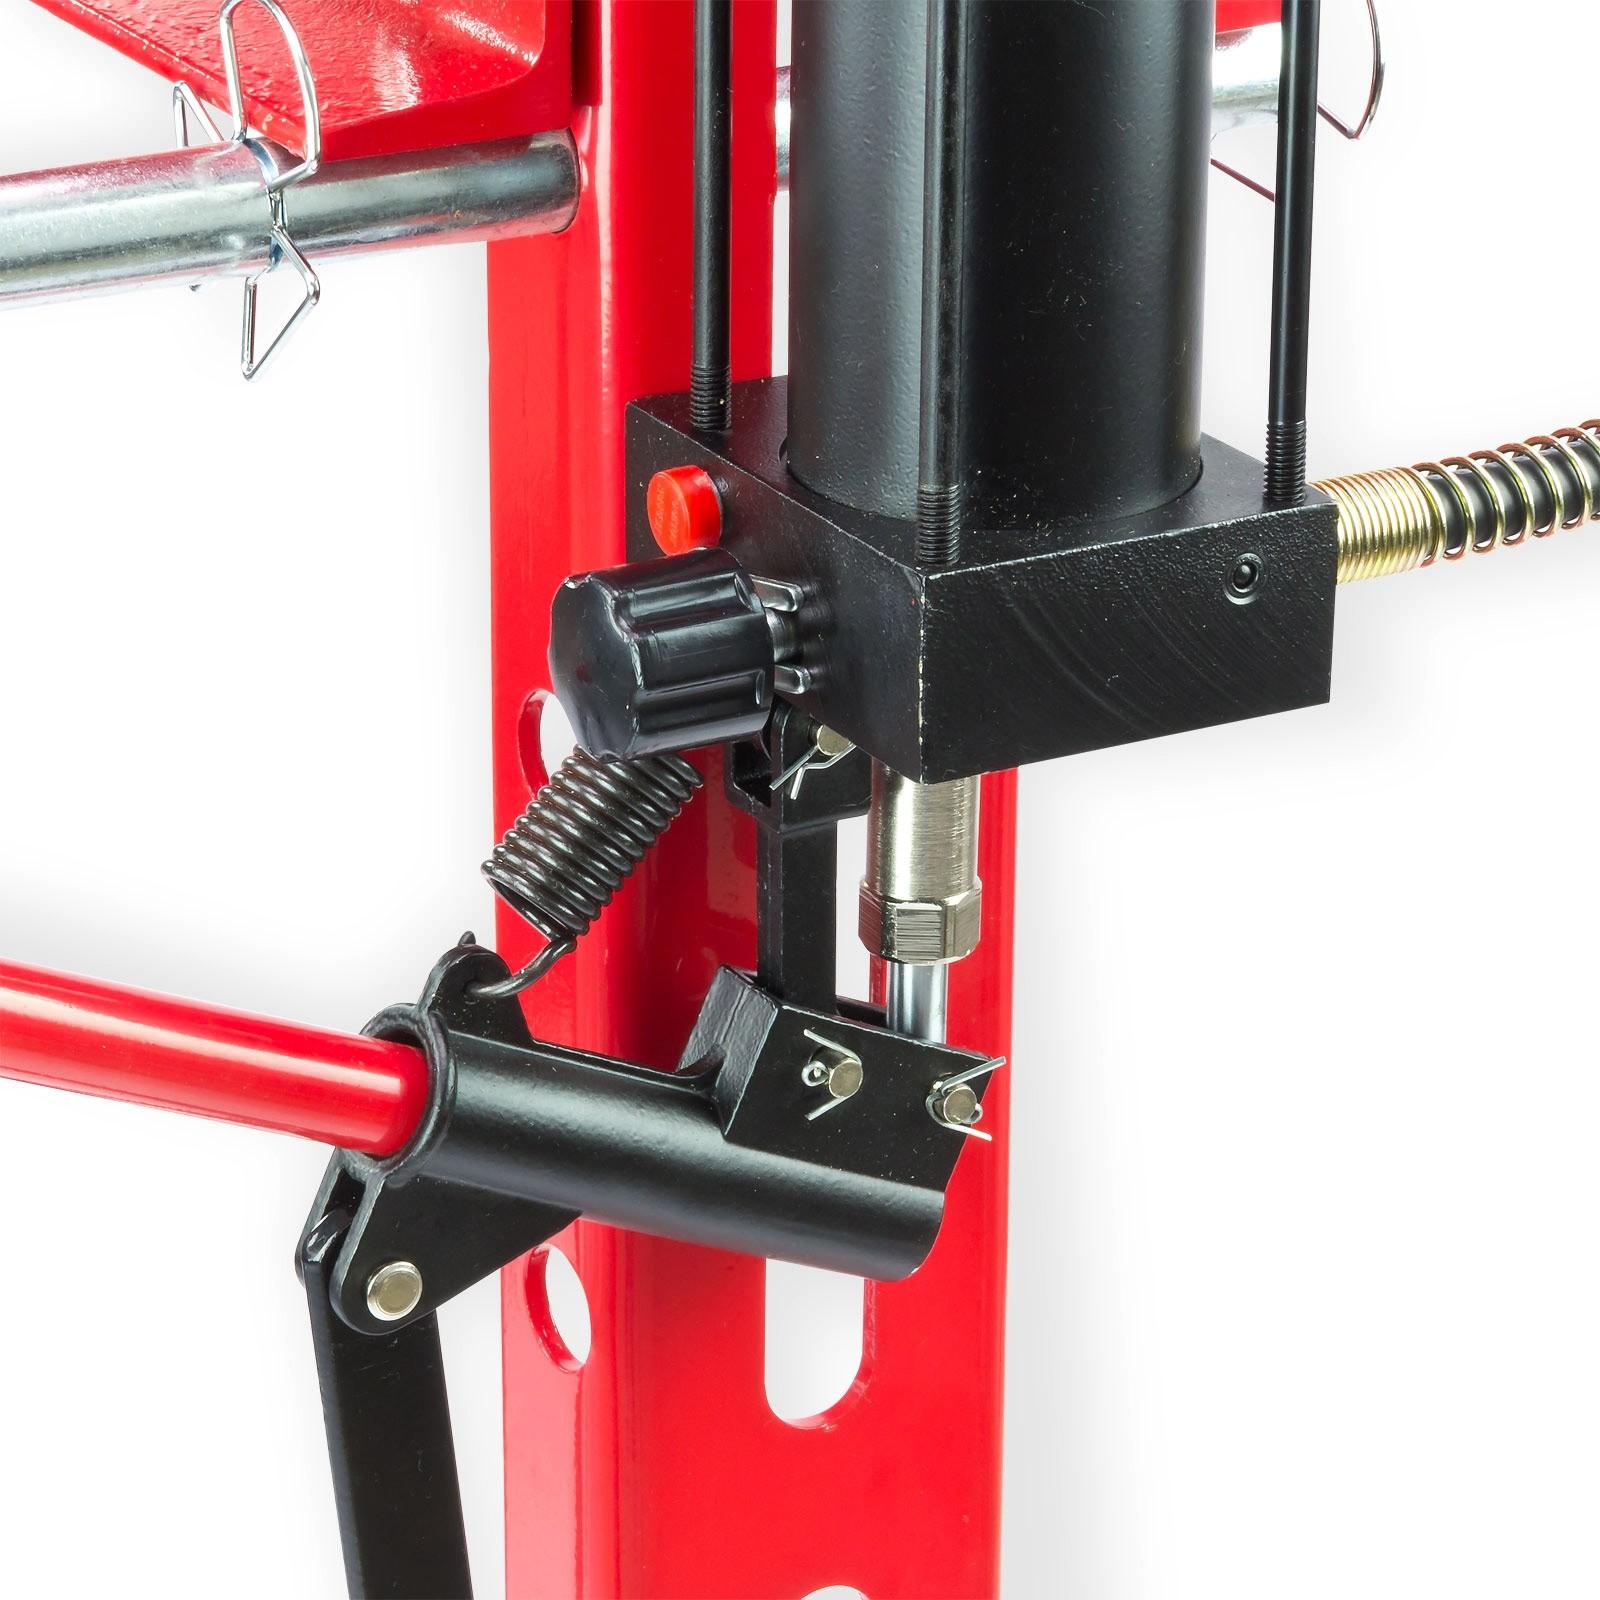 20 tonnen werkstattpresse manuell pedal inkl hydraulikpumpe. Black Bedroom Furniture Sets. Home Design Ideas